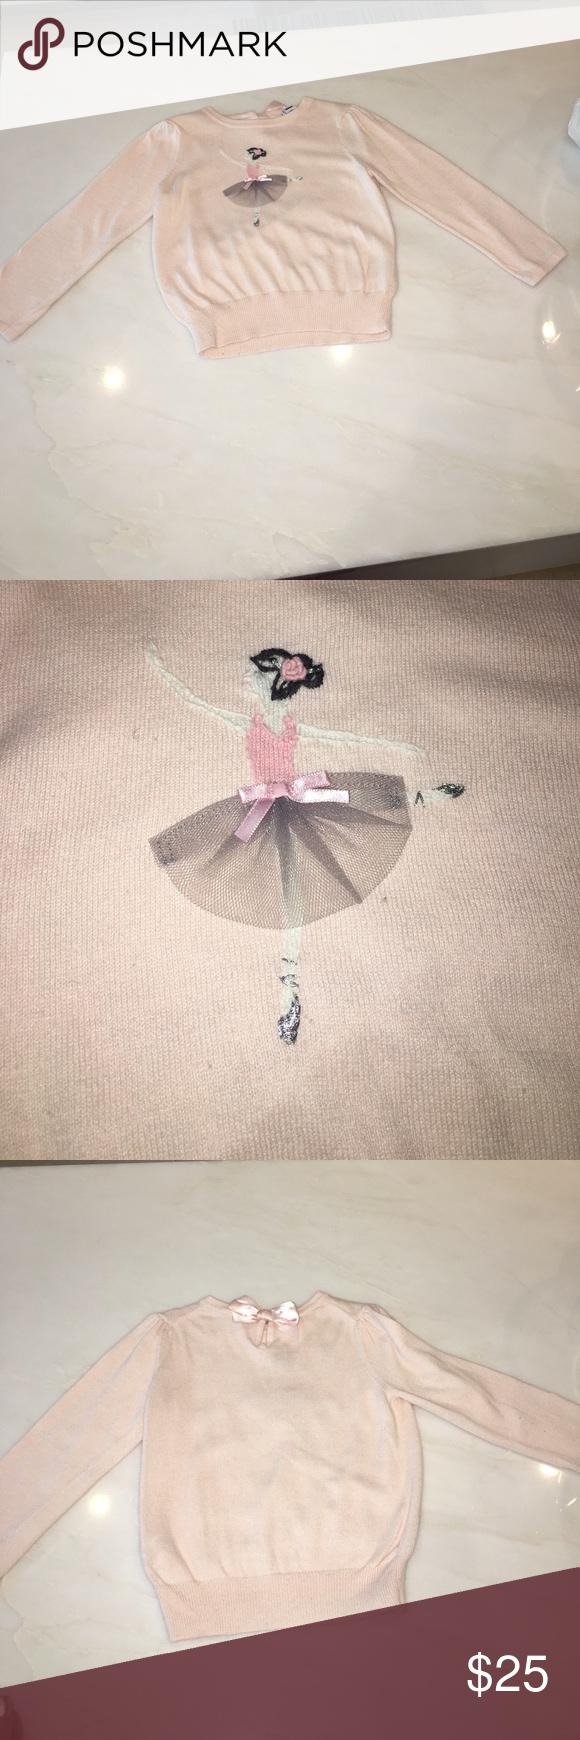 Janie and jack light pink ballerina sweater Janie & Jack